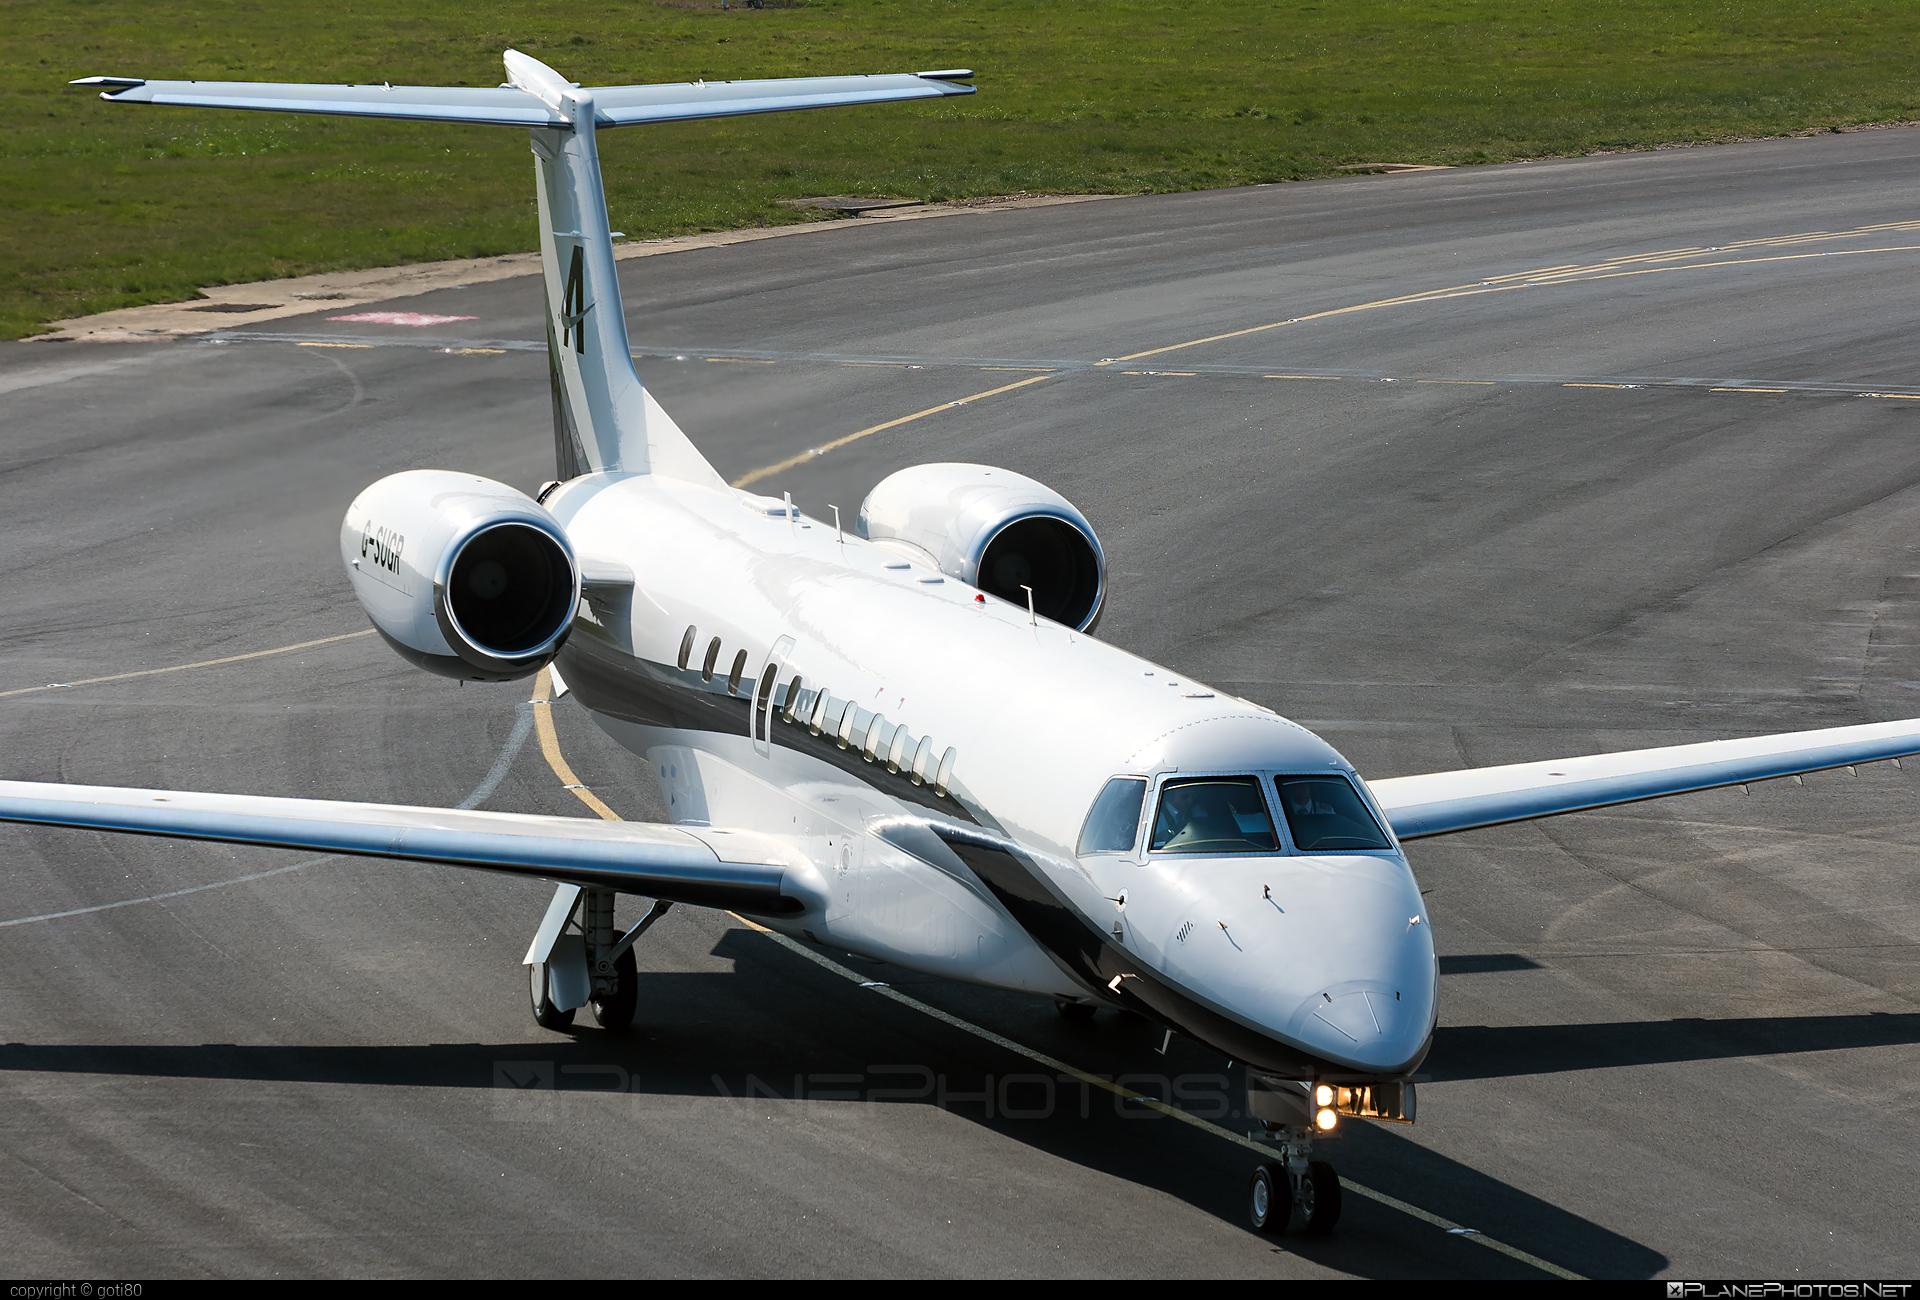 Embraer ERJ-135BJ Legacy 650 - G-SUGR operated by Air Charter Scotland #embraer #embraer135 #embraerlegacy #erj135 #erj135bj #legacy650